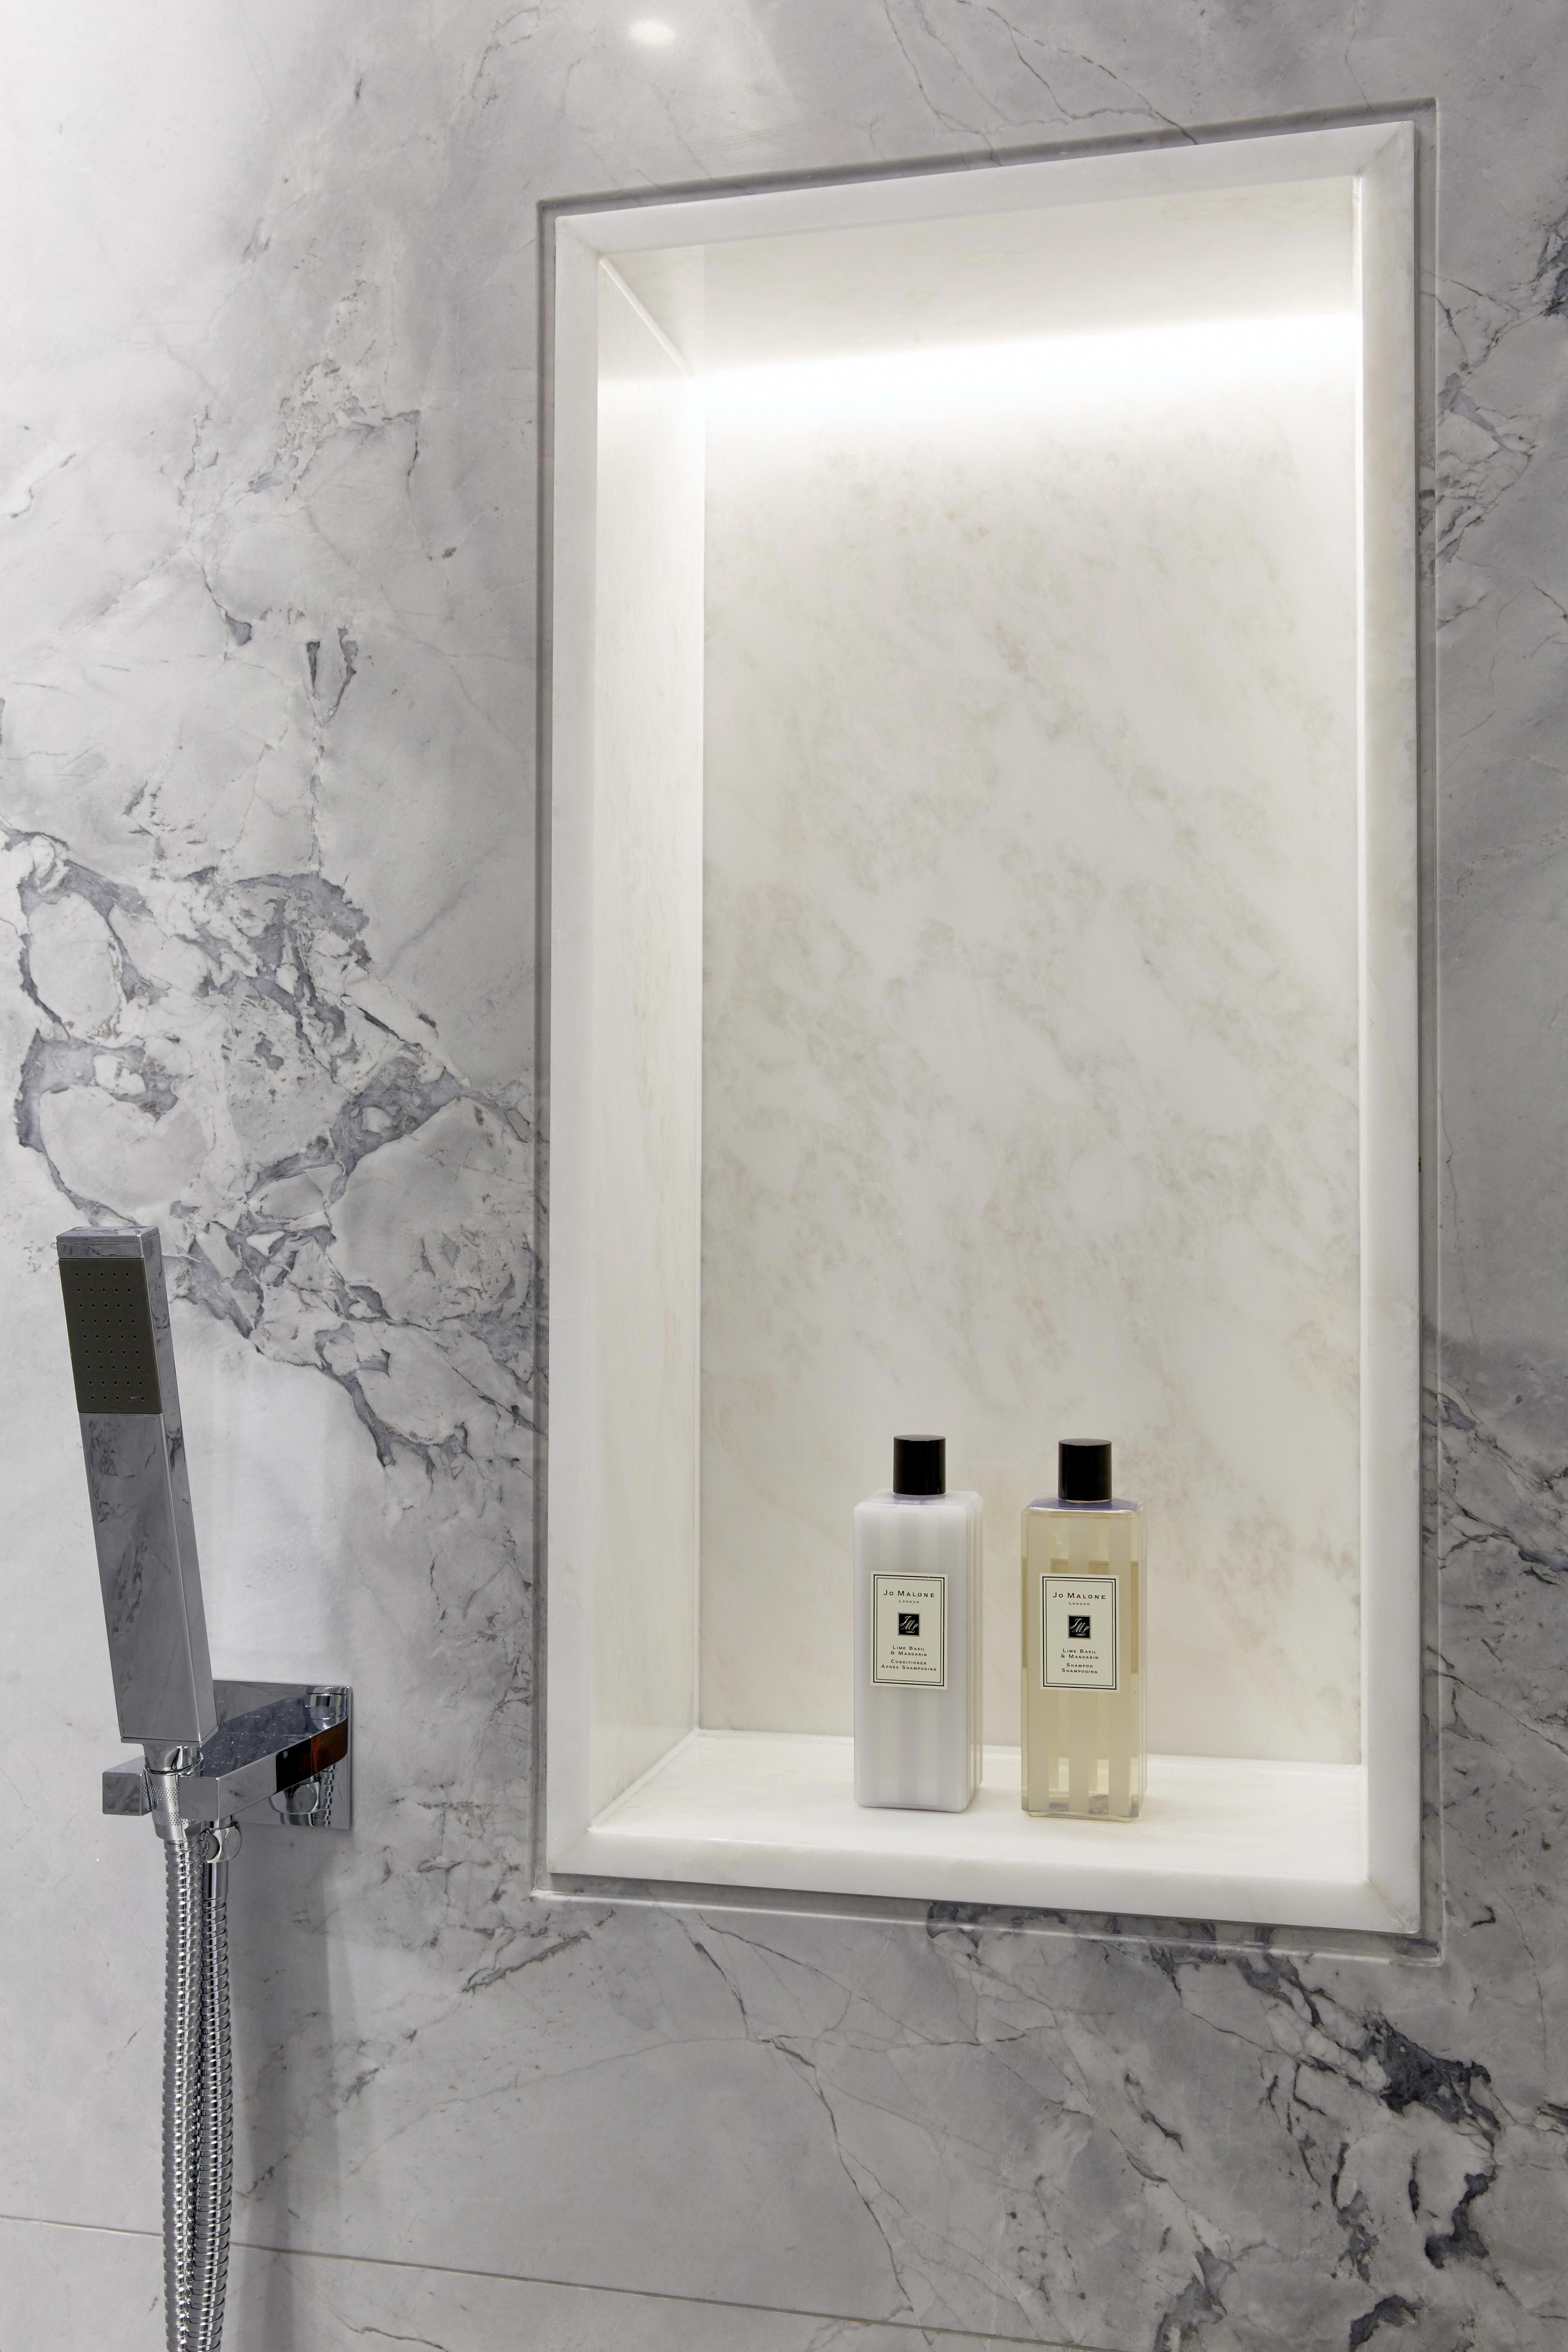 Prepare Your Bathroom For 2019 With The Best Lighting Decor Www Lightingstores Eu Vis Bathroom Inspiration Decor Bathroom Recessed Lighting Bathroom Decor